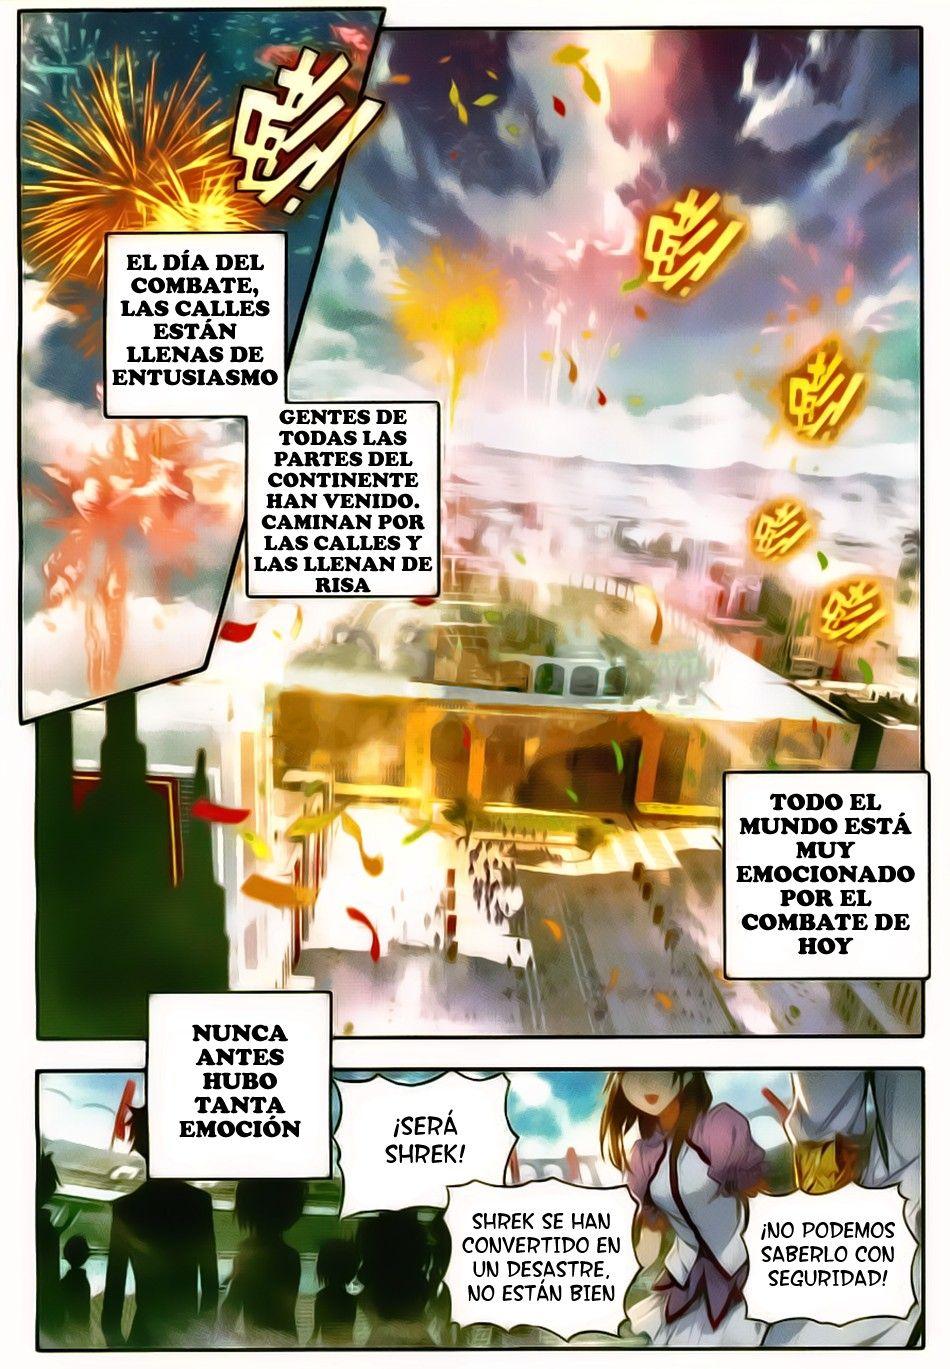 https://c5.ninemanga.com/es_manga/pic2/33/16417/514027/c05ba499b1778466cb7042b6b70676ce.jpg Page 2